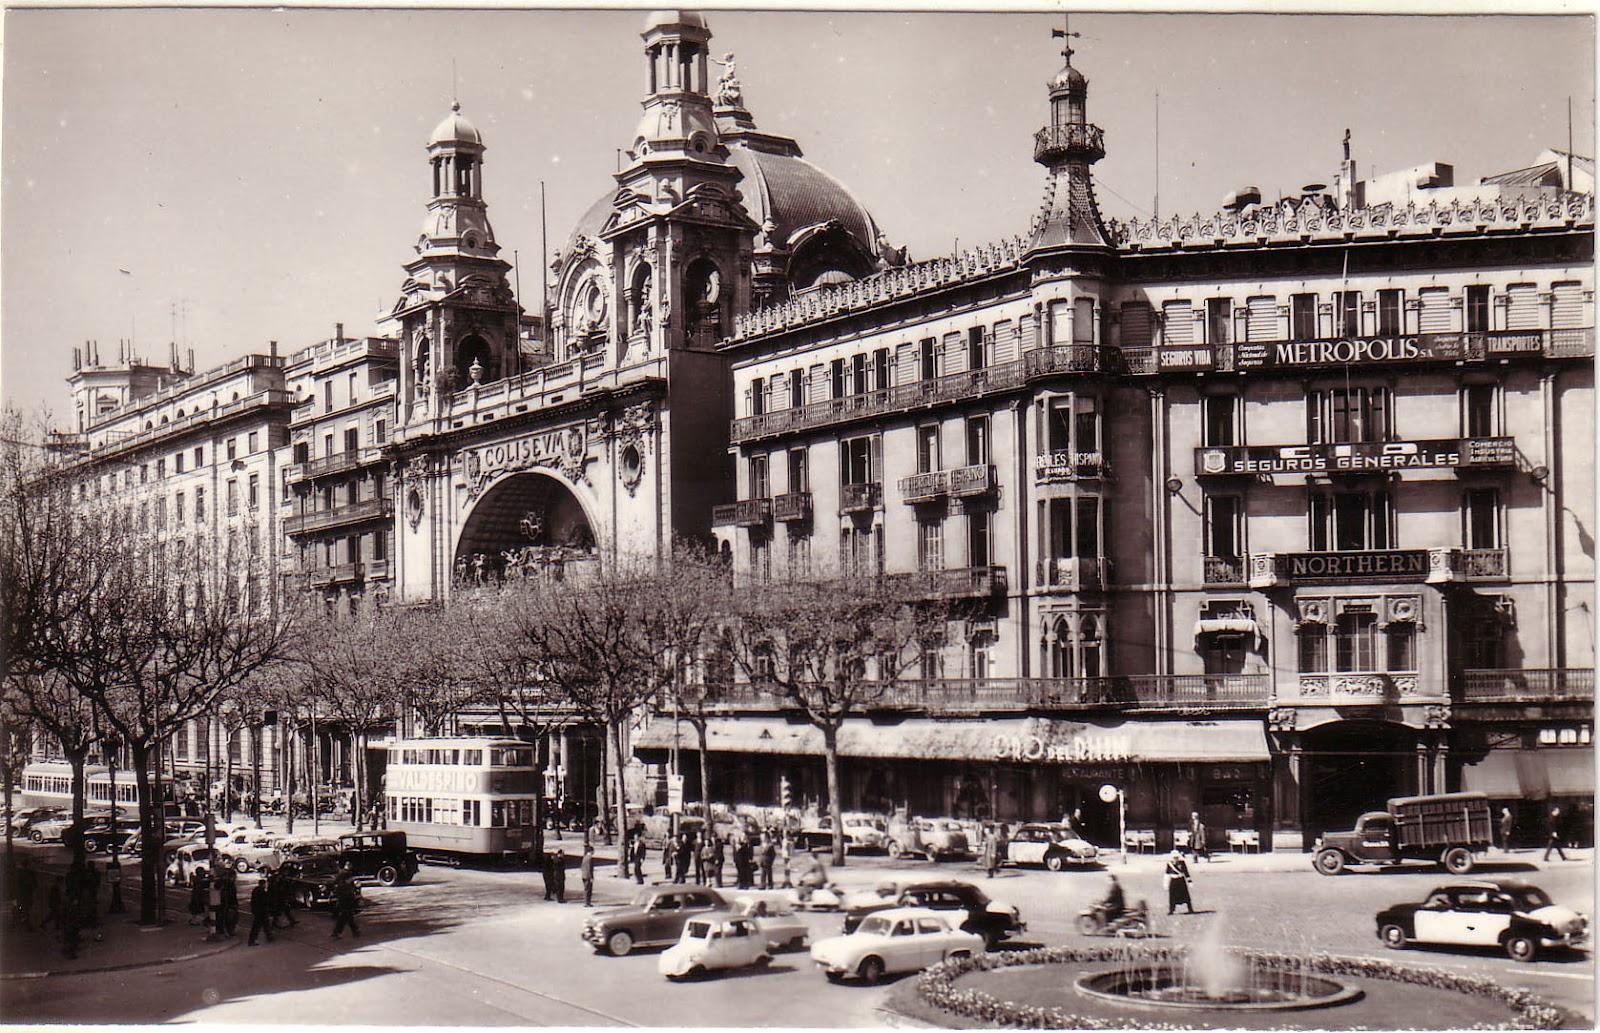 Cines Barcelona Cine Coliseum